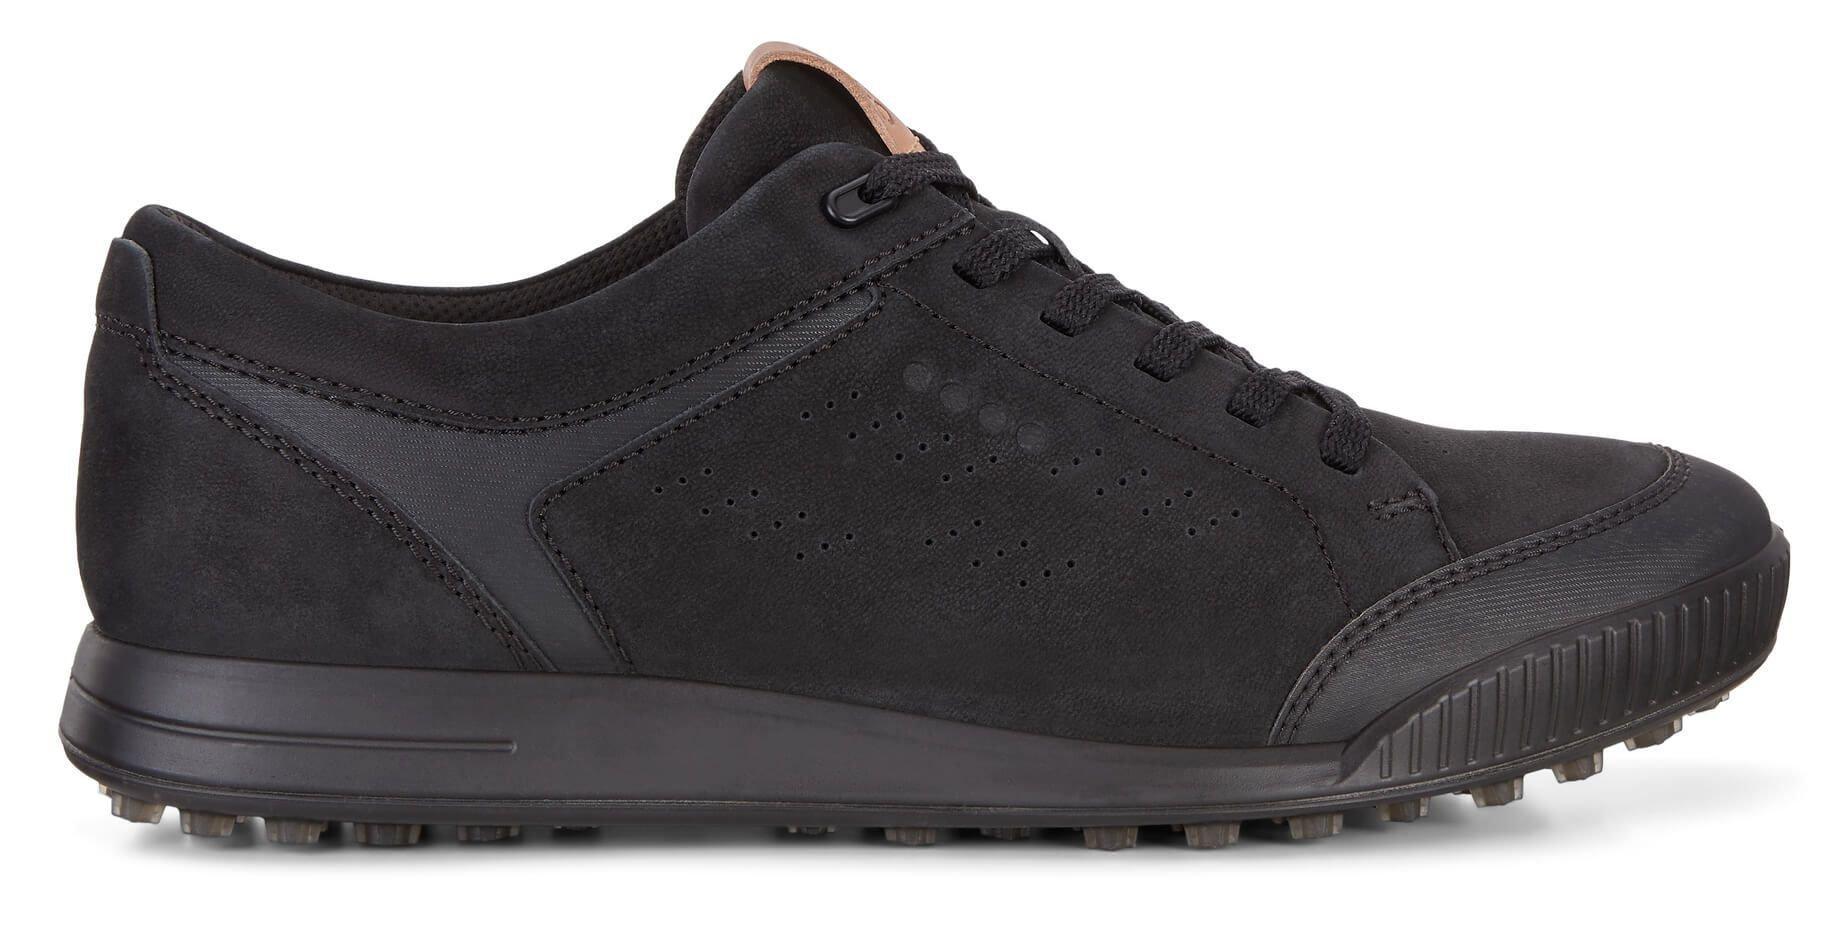 ECCO Street Retro LX Golf Shoes Black